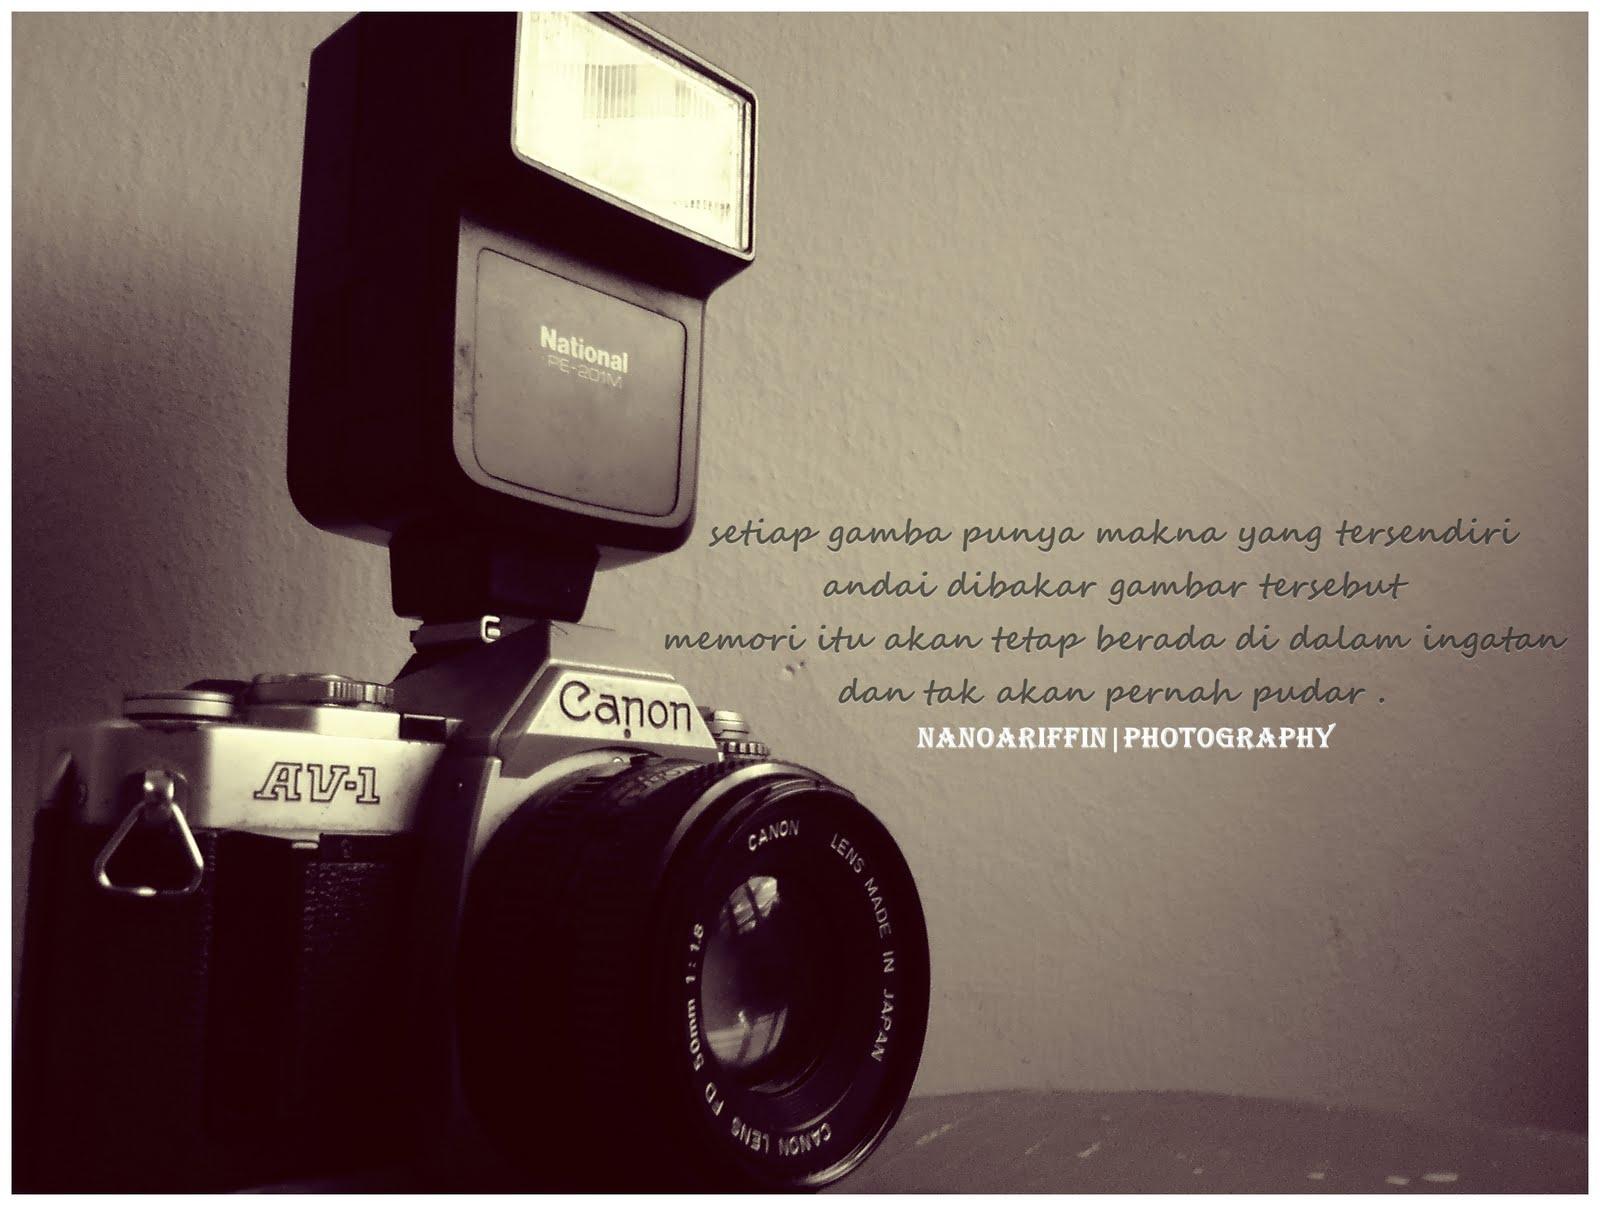 kamera+dslr+kartun.JPG